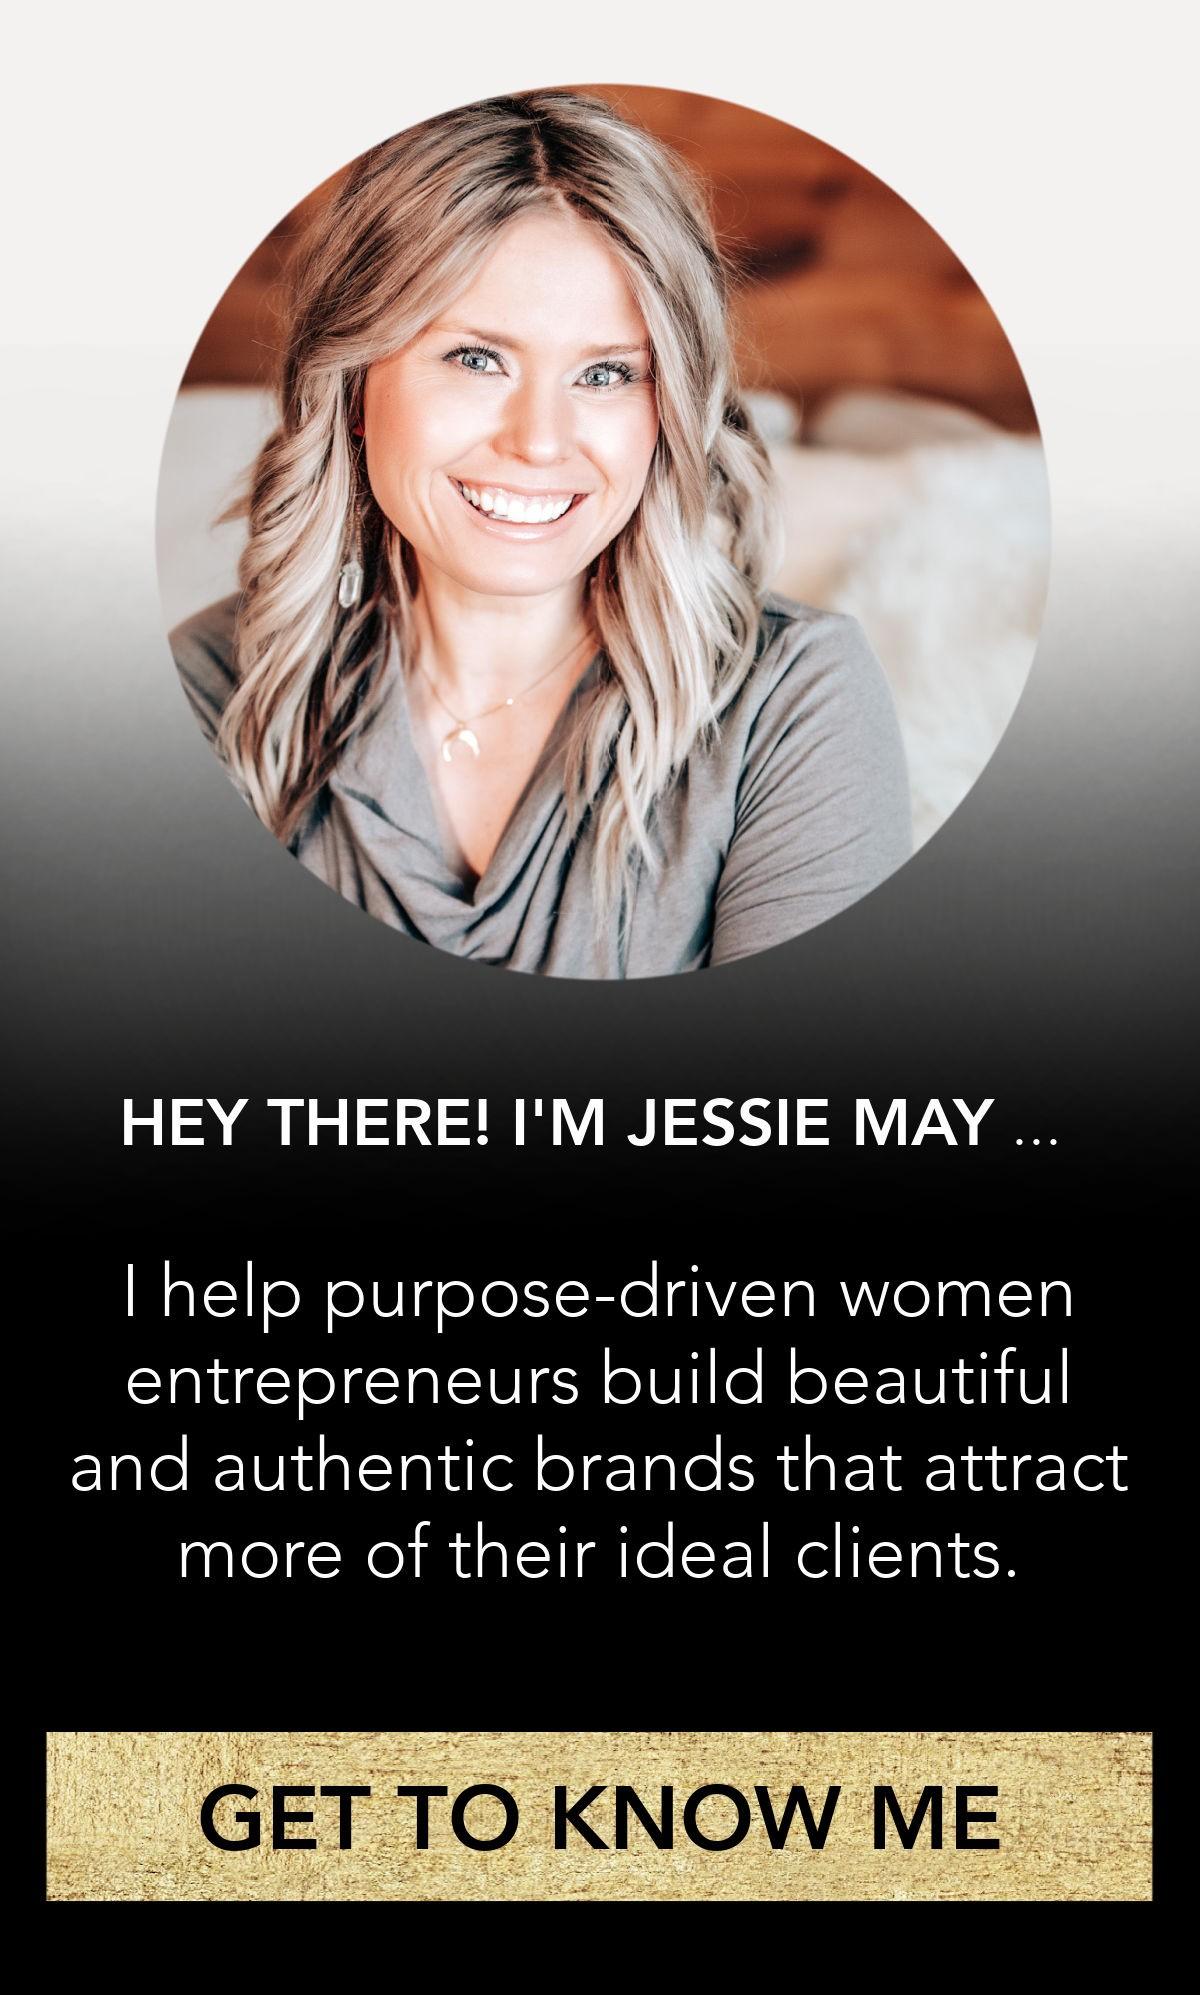 Meet Jessie May